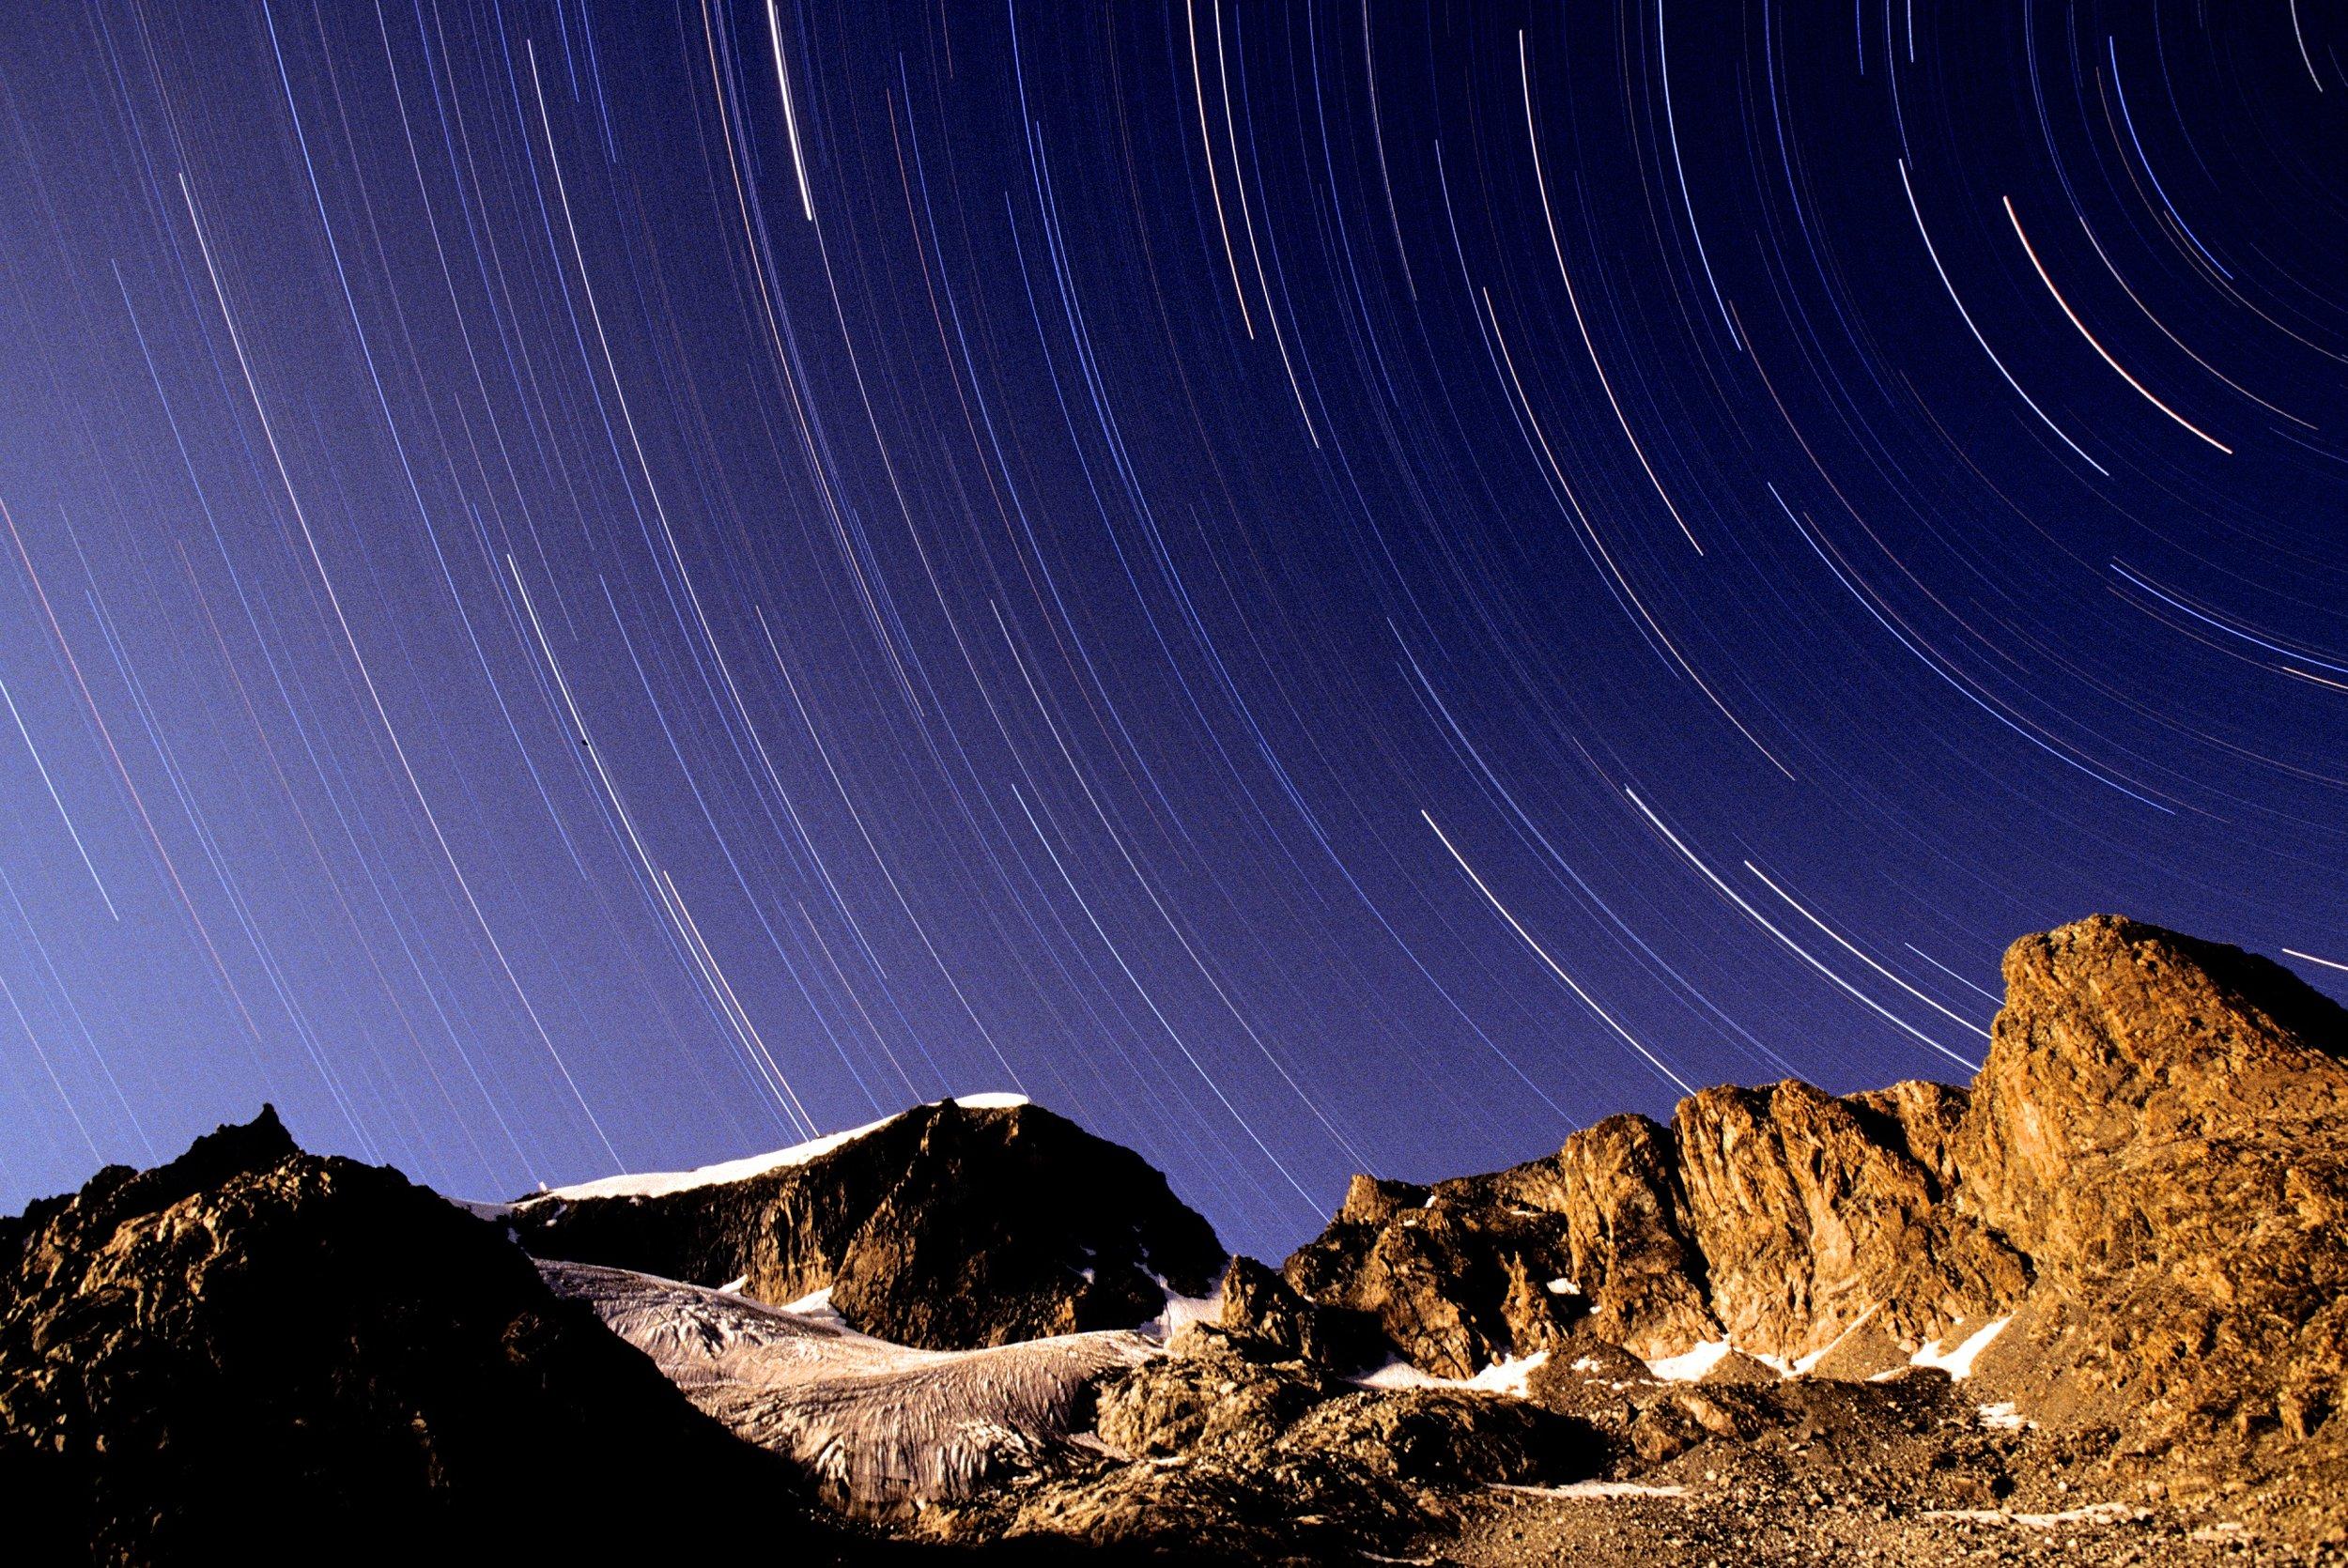 Star trails over Gannet Peak, Wind River Range, WY.